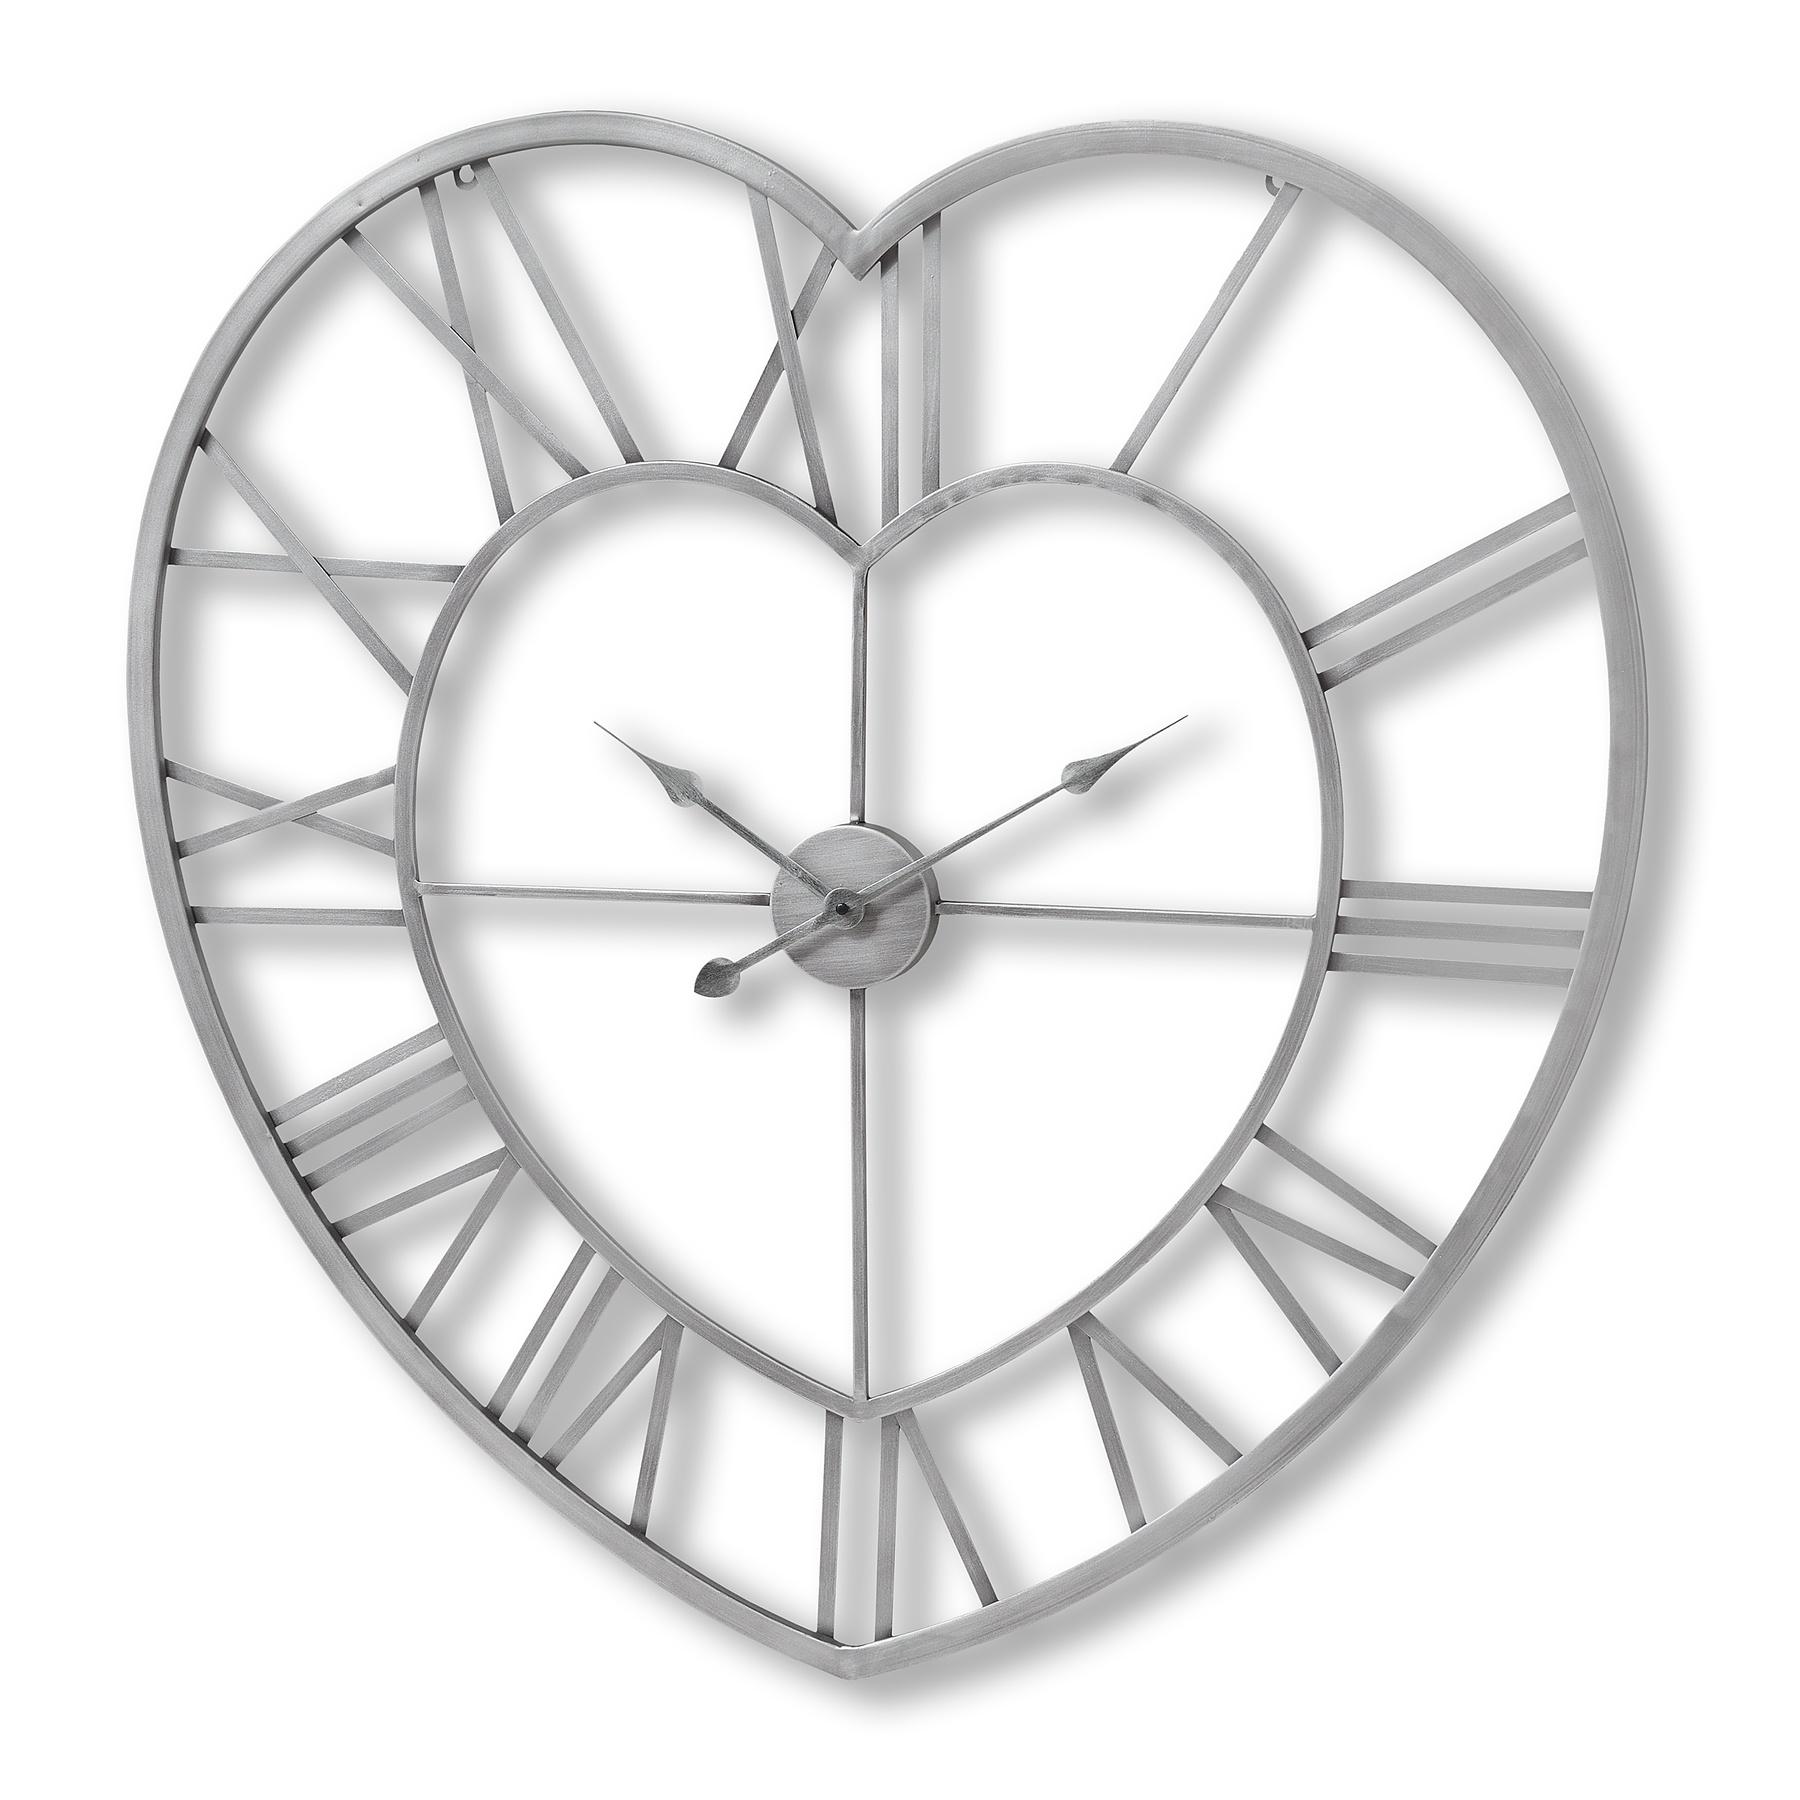 Silver Metal Frame Heart Clock